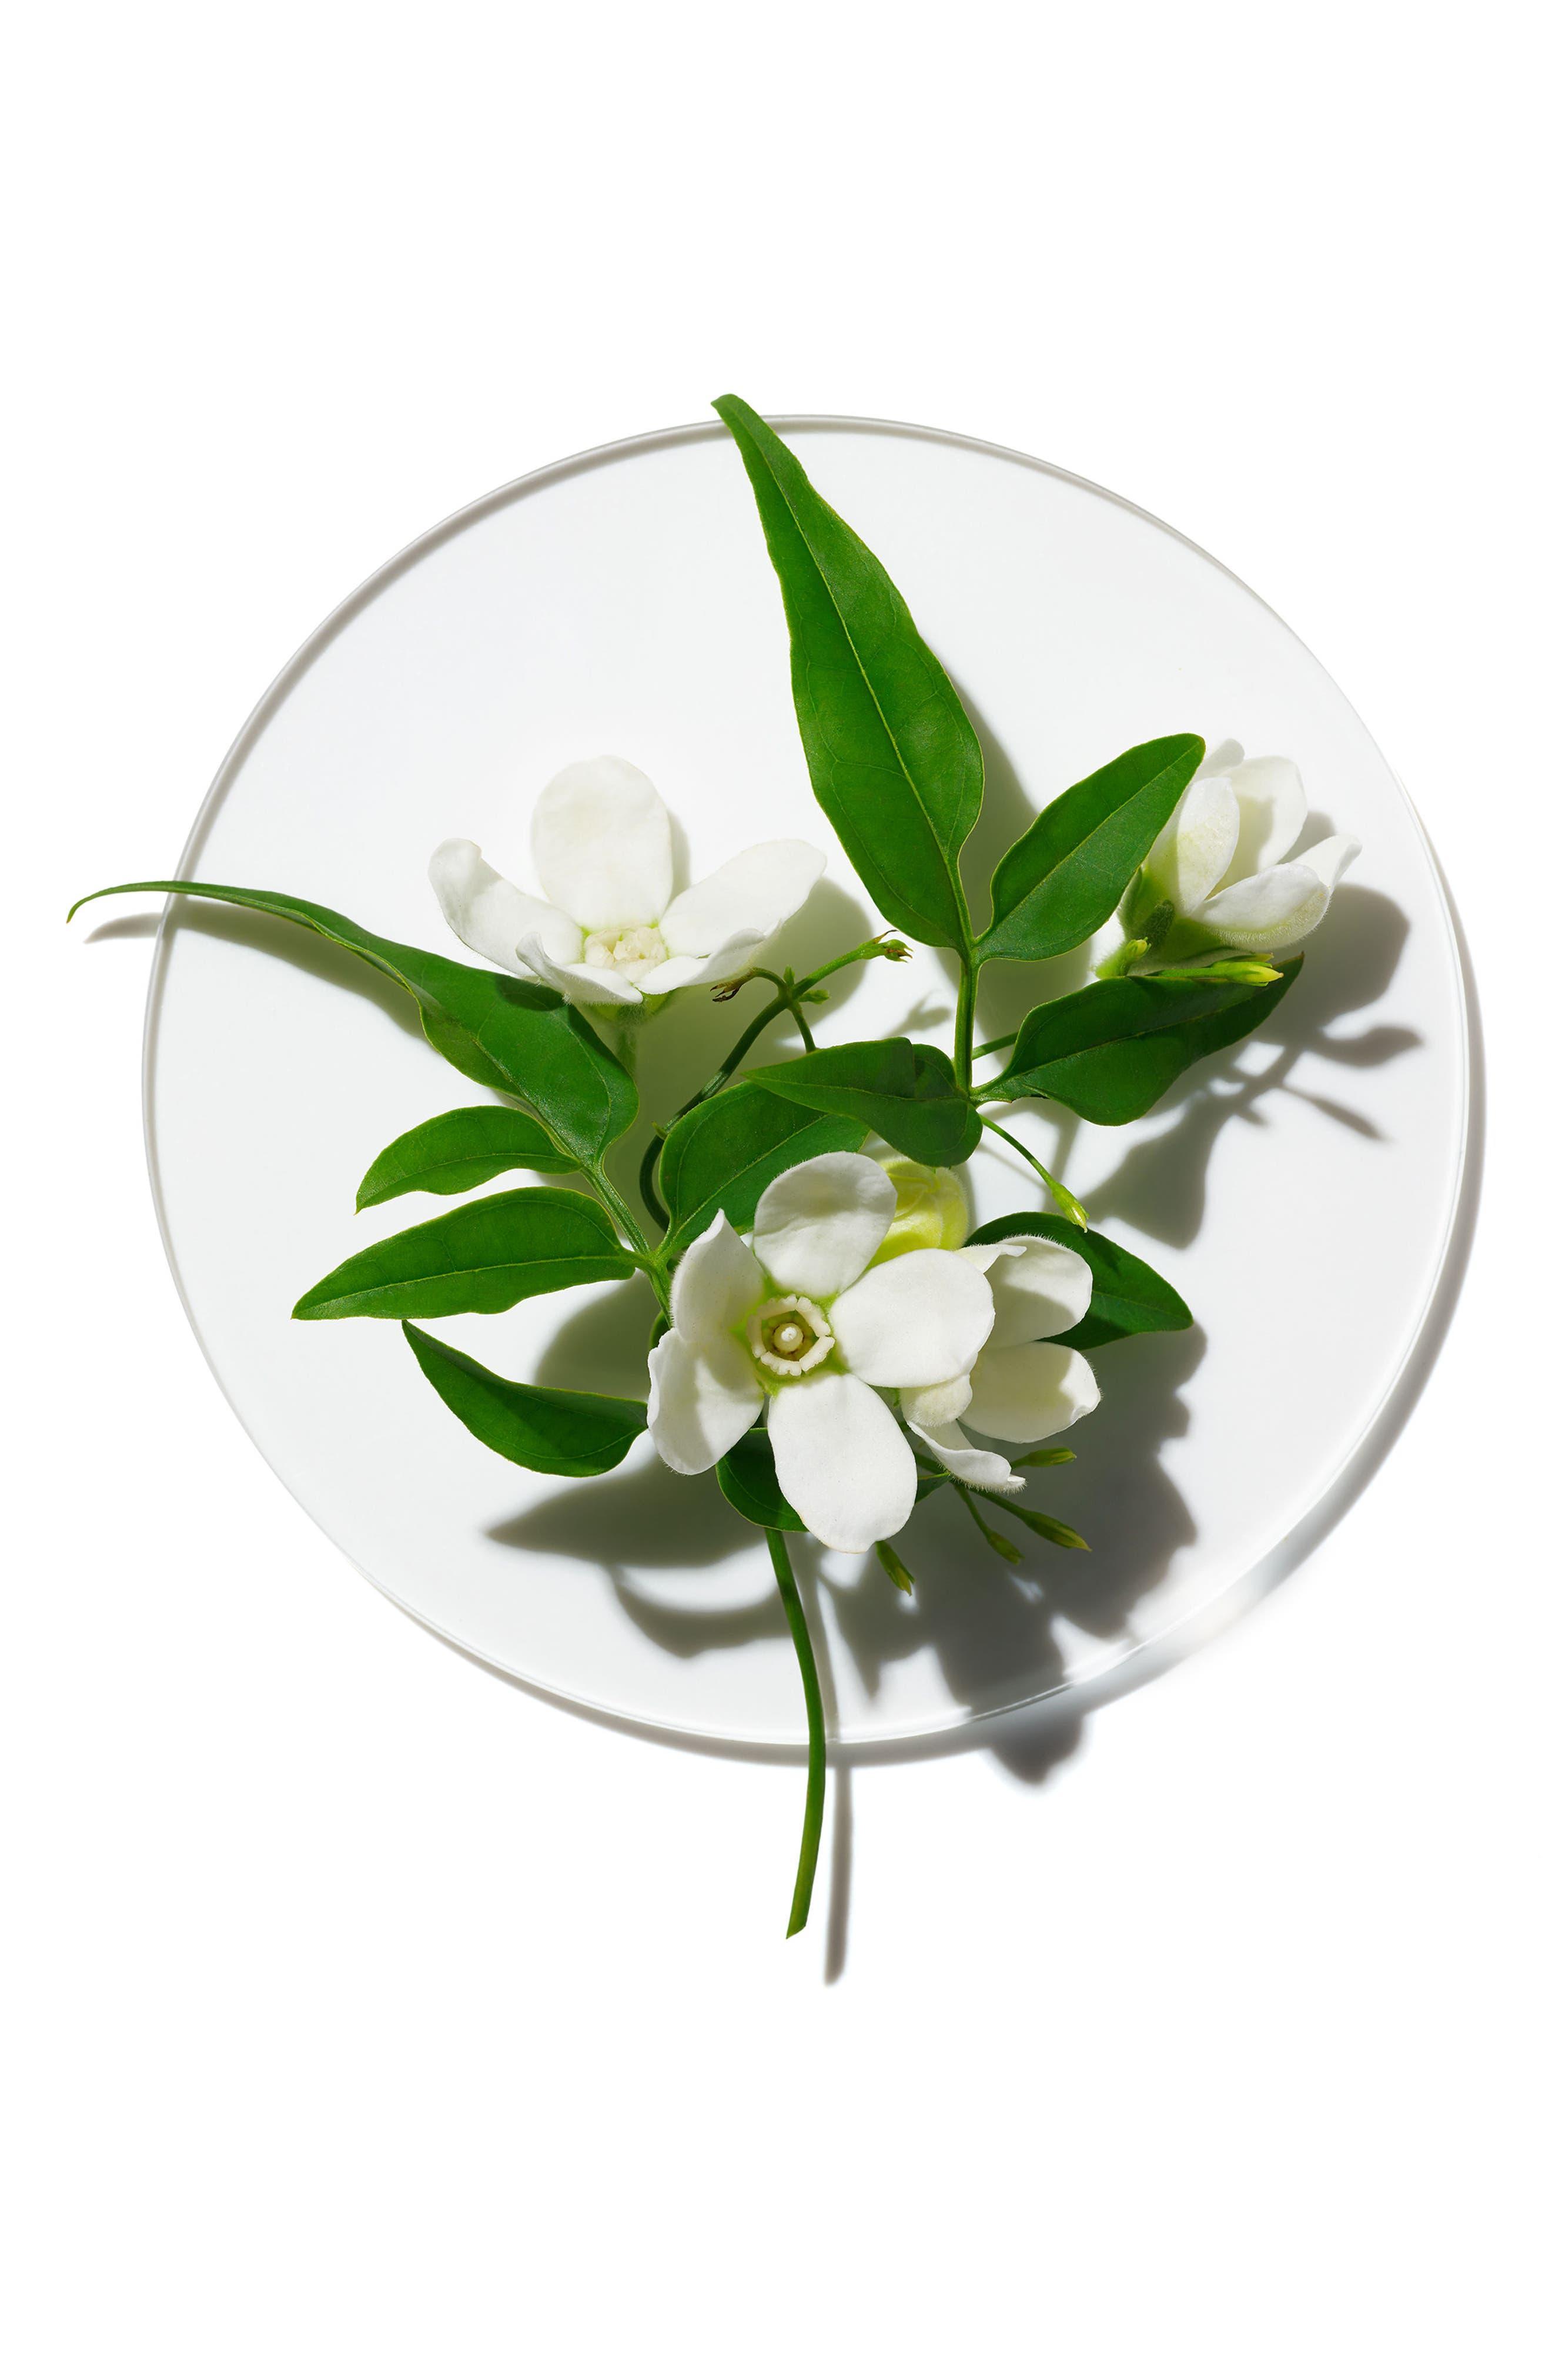 My Happy Peace and Jasmine Fragrance,                             Alternate thumbnail 3, color,                             000